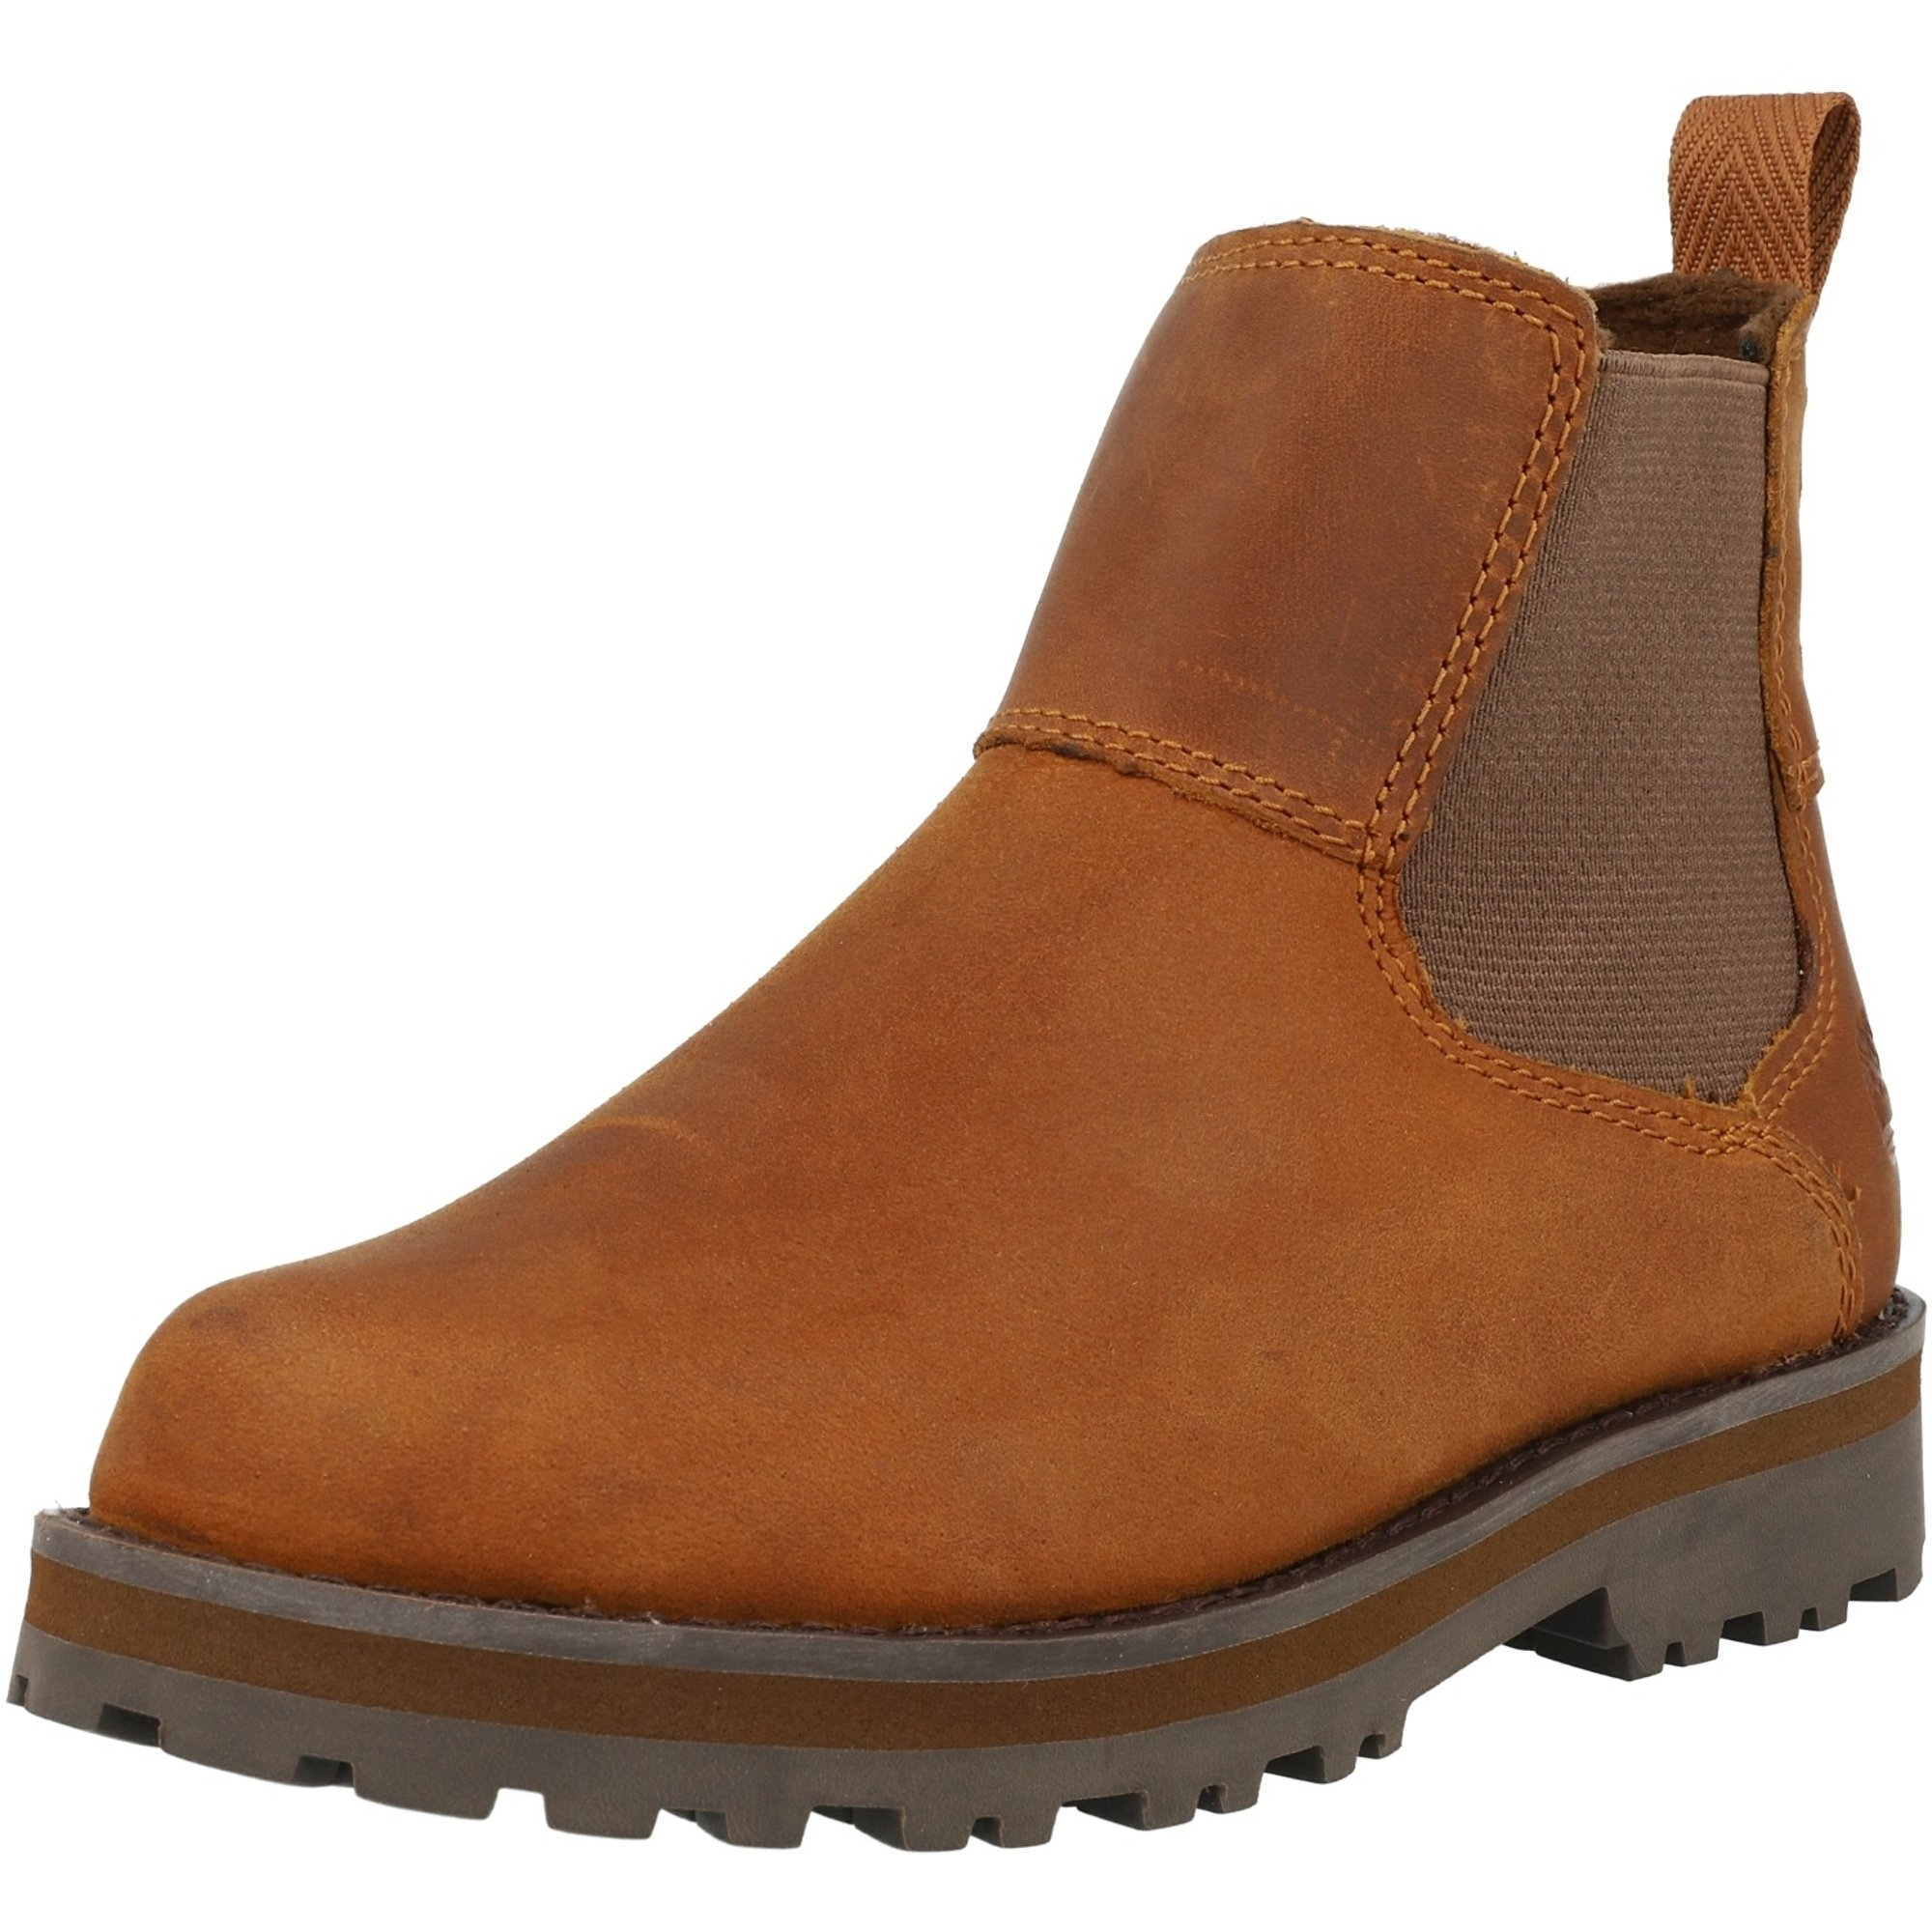 Timberland Courma Kid Chelsea Y Medium Brown Full Grain Leather